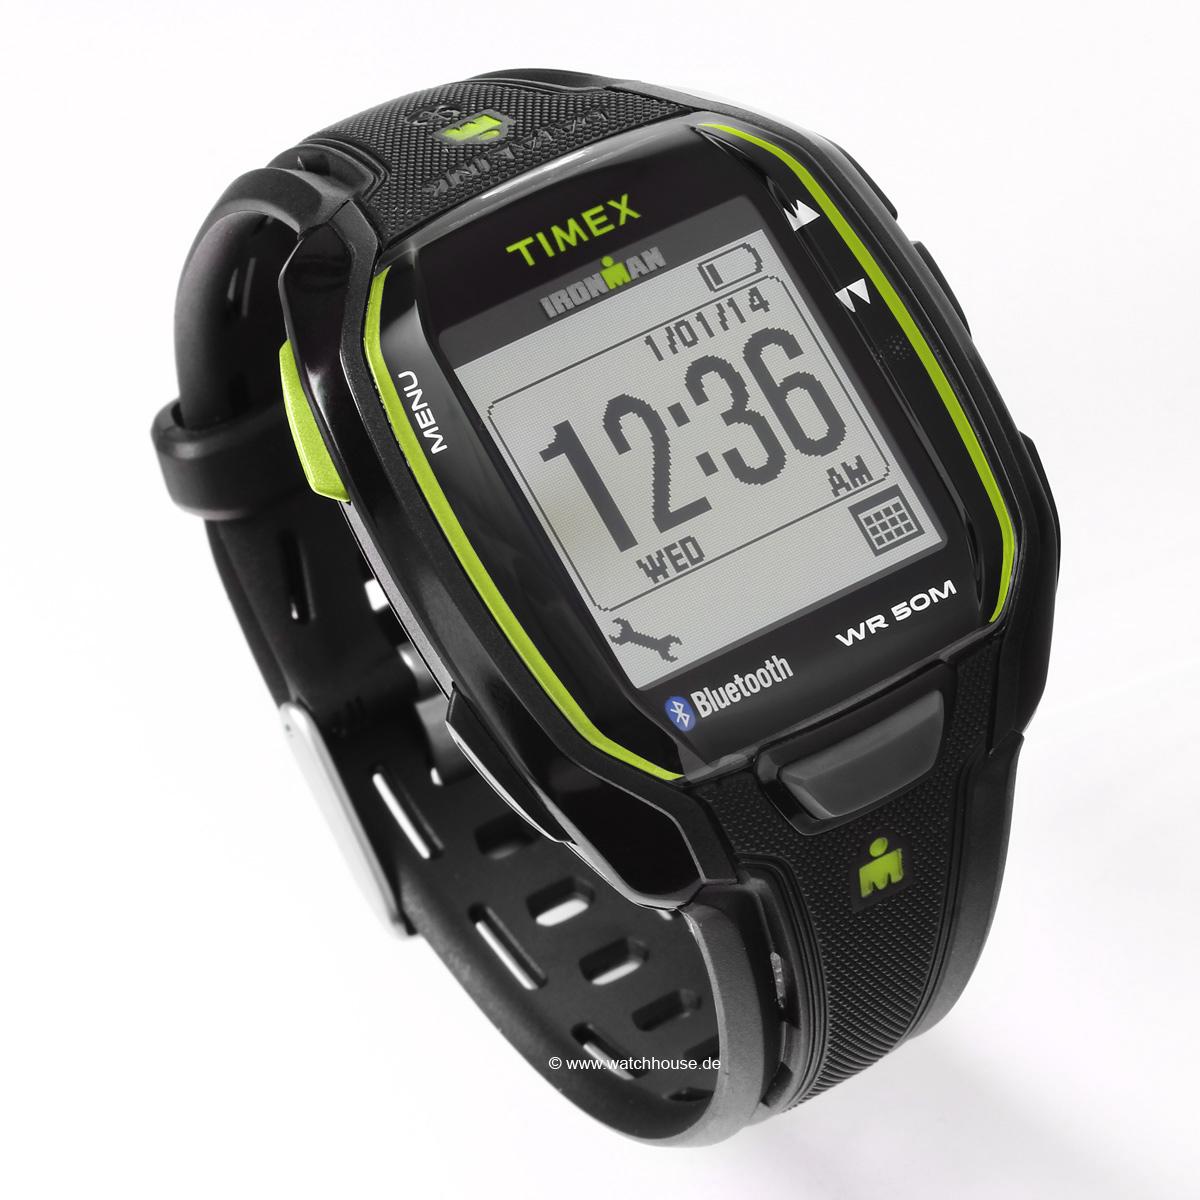 Timex Ironman Run x50 Sportchronograph TW5K84500 Smart Watch